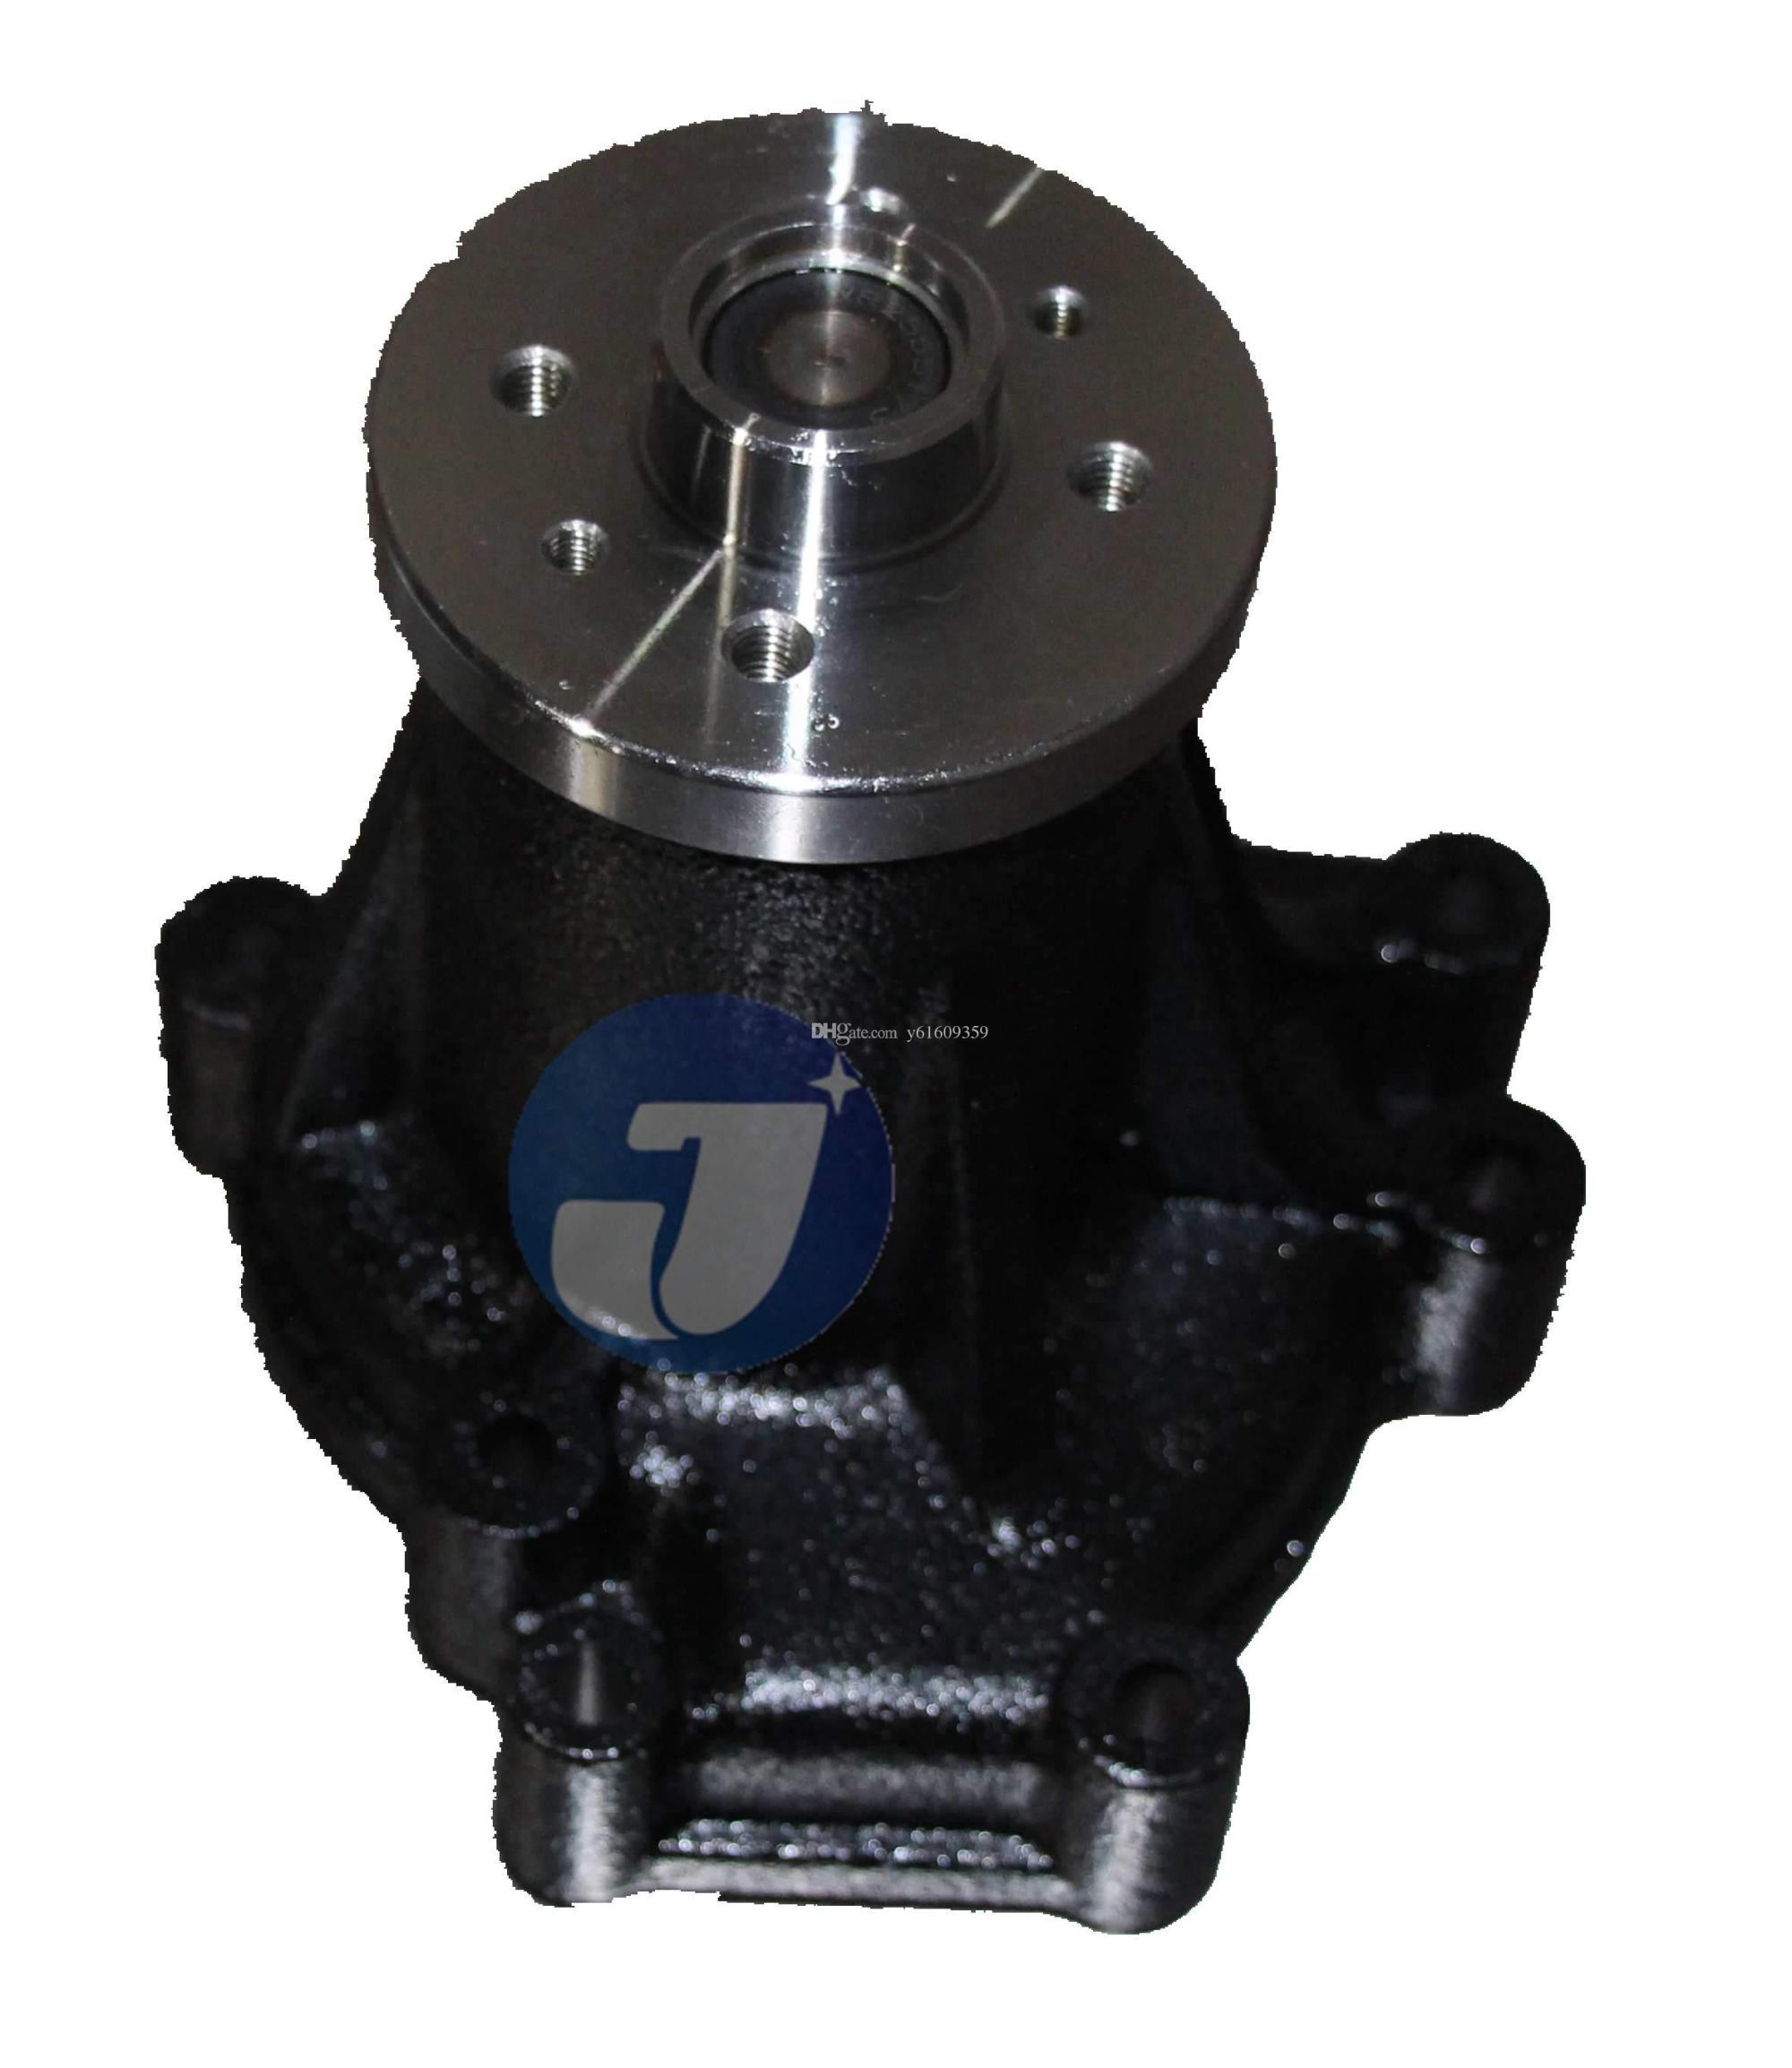 hight resolution of 8 98038845 0 isuzu water pump ass y 8980388450